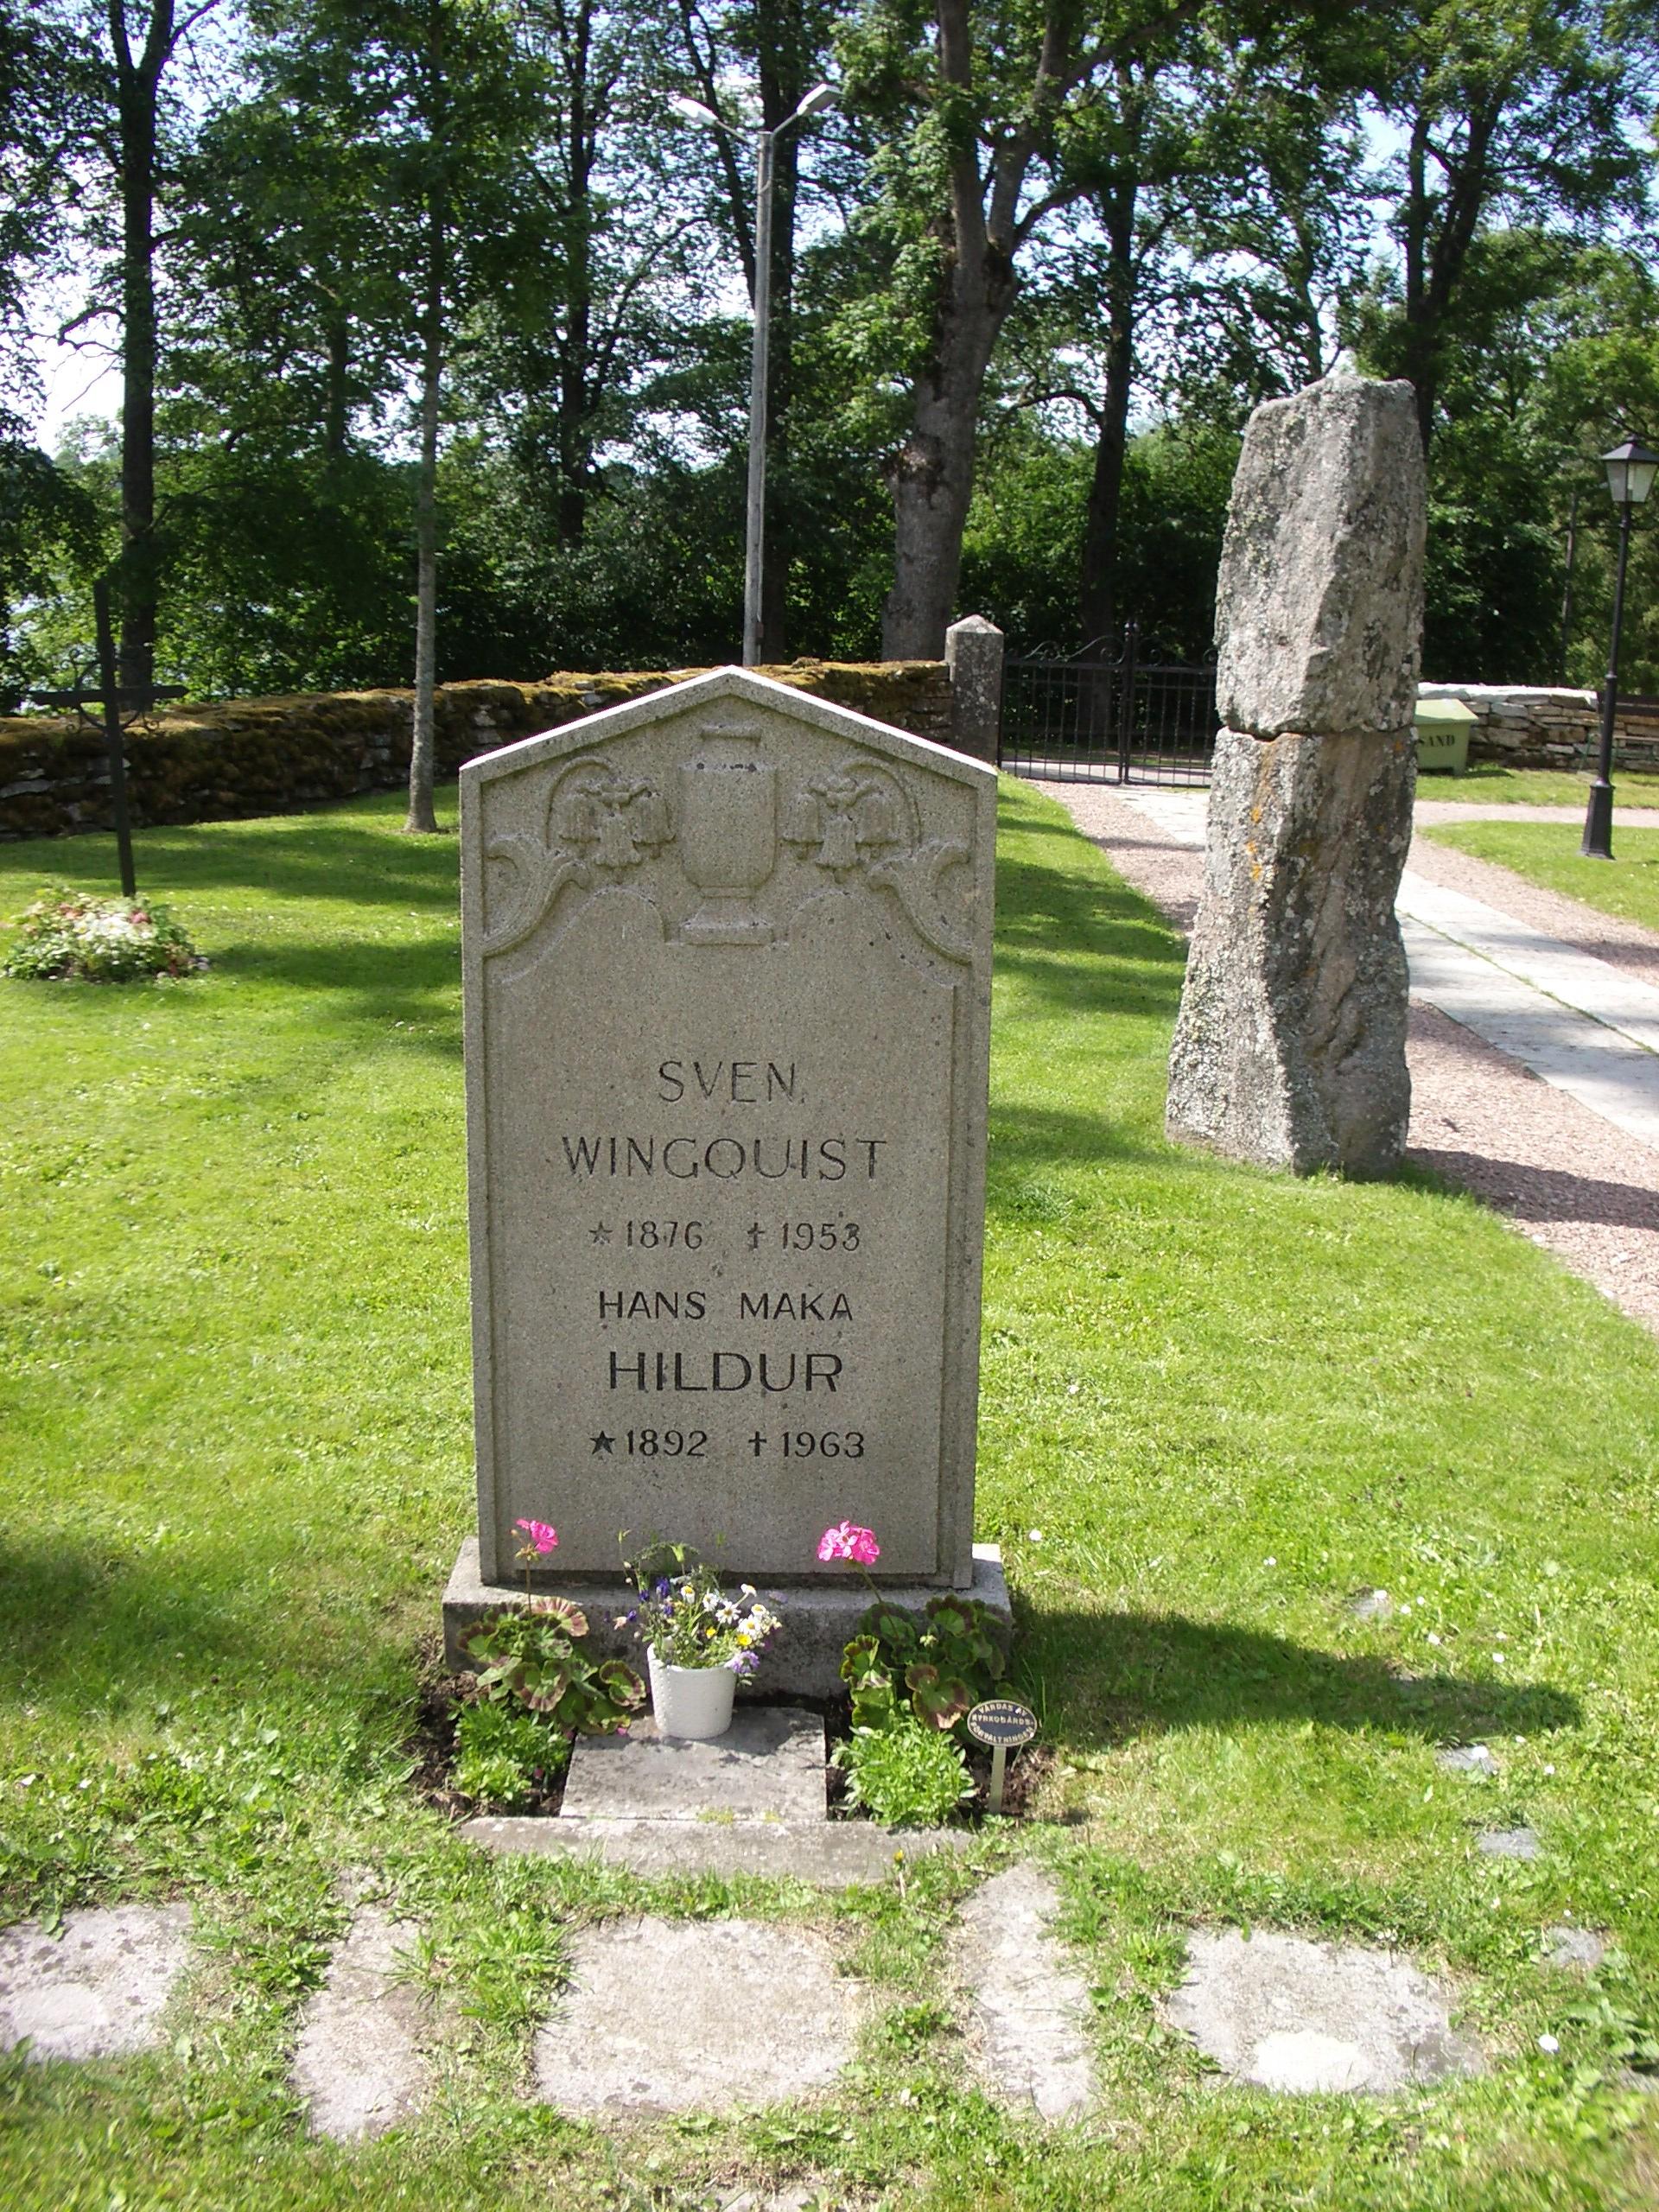 Sdra Ving Parish, lvsborg, Sweden Genealogy Genealogy